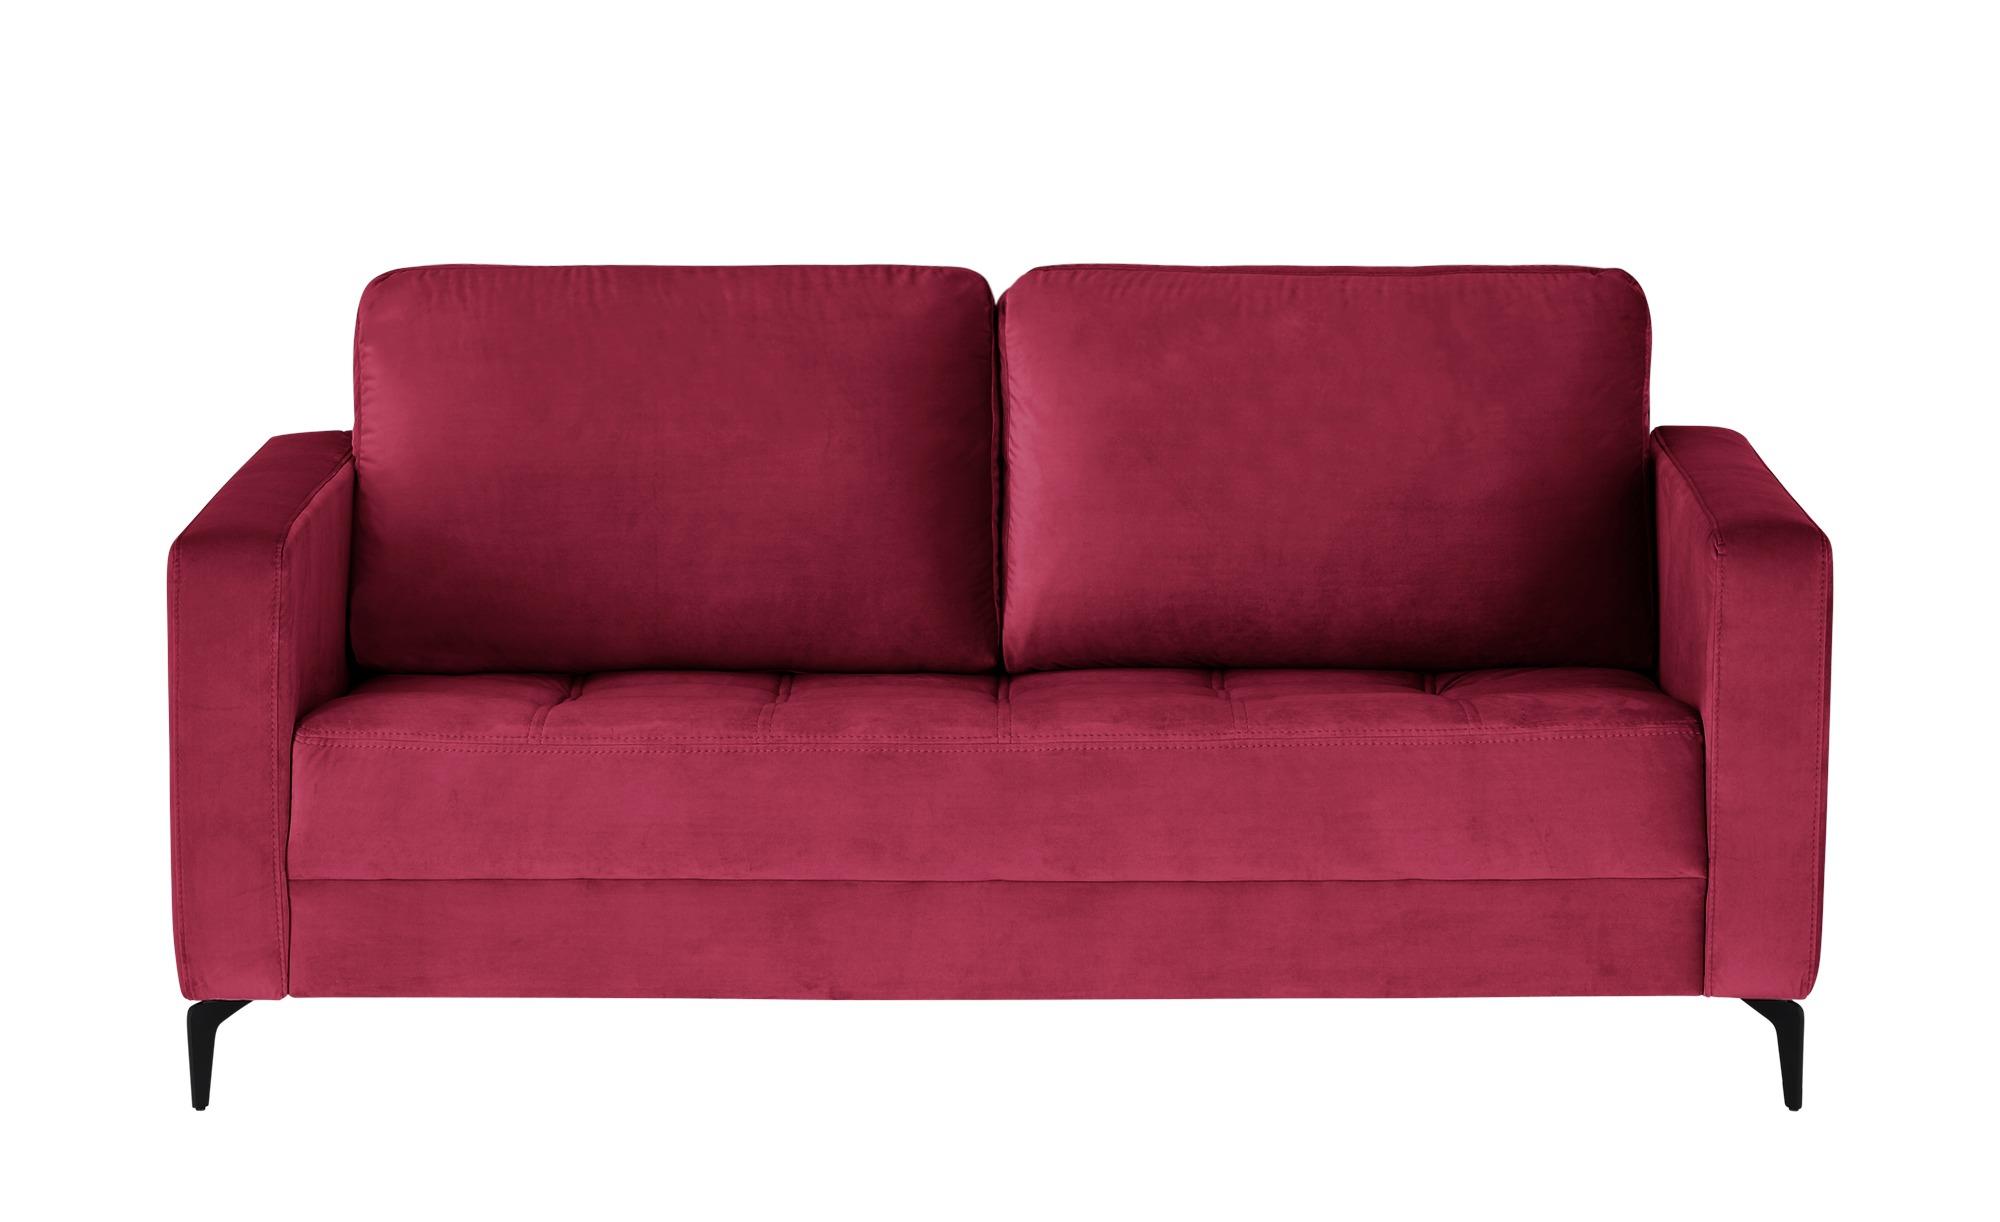 smart Sofa  Gesa ¦ rot ¦ Maße (cm): B: 178 H: 83 T: 91 Polstermöbel > Sofas > 2-Sitzer - Höffner